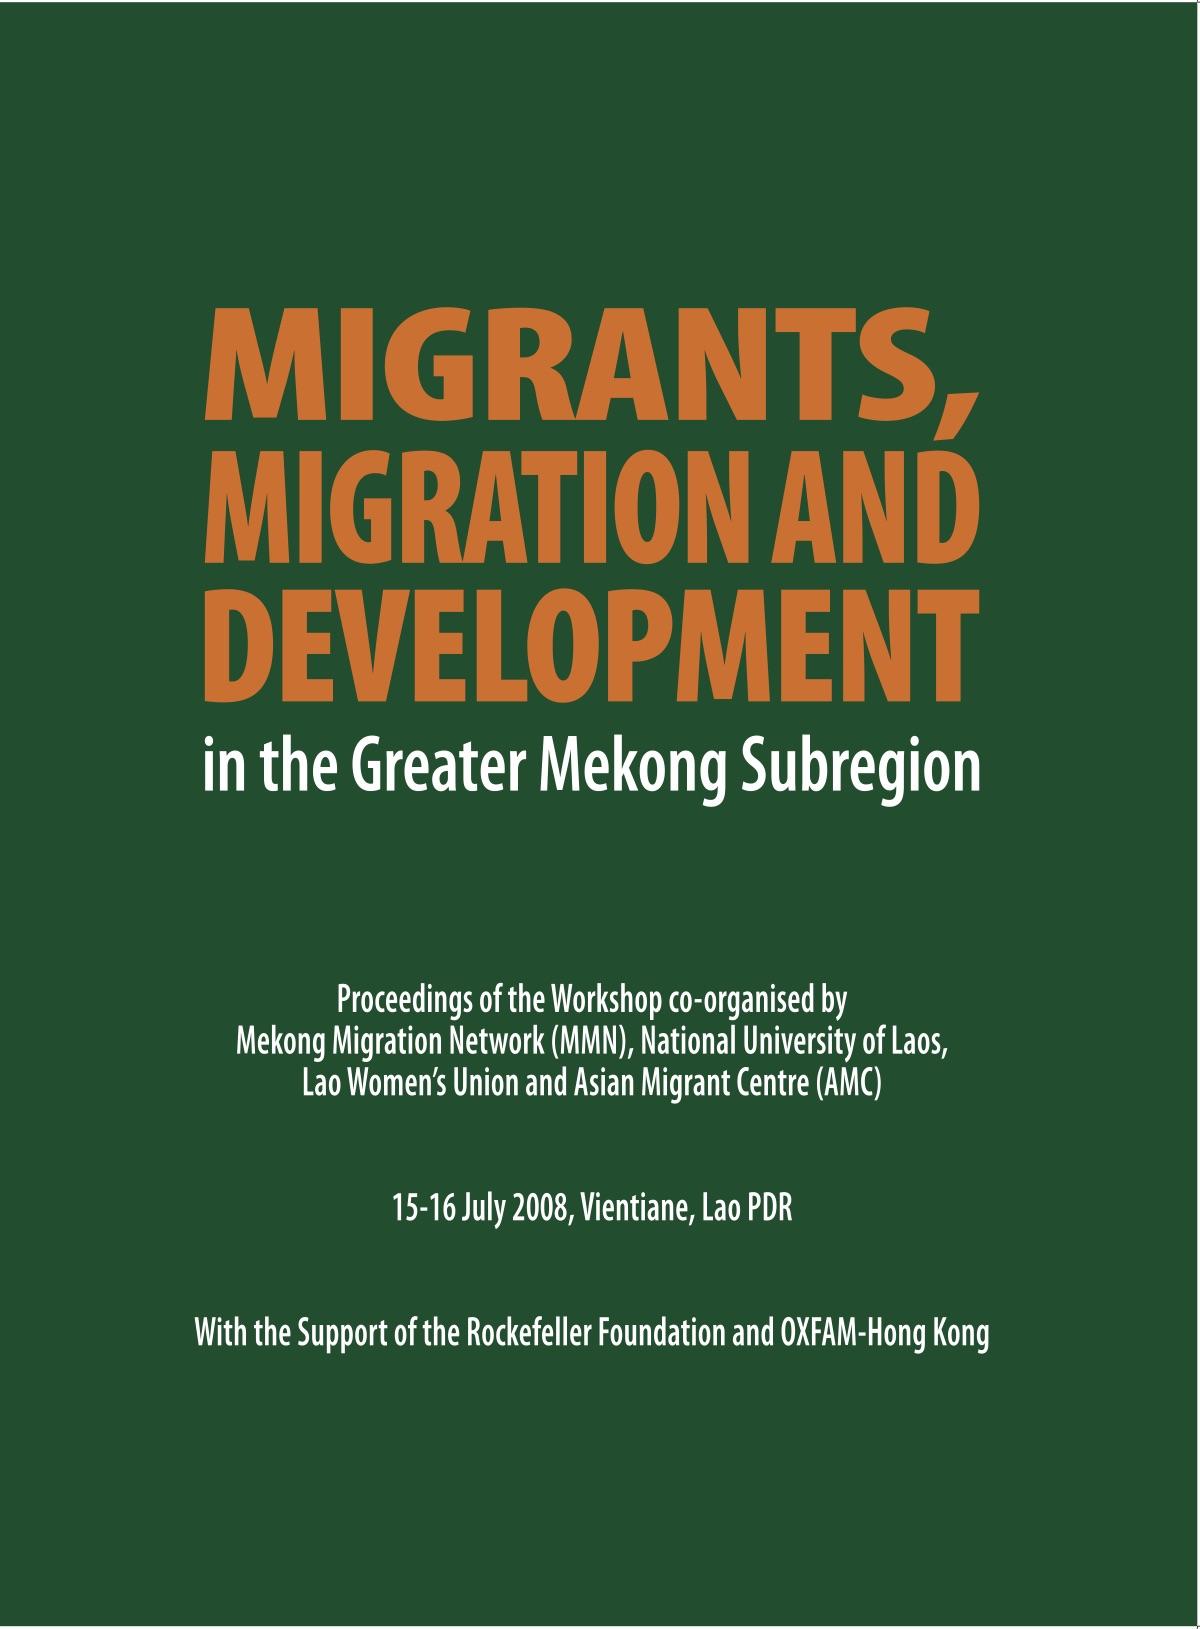 2008 MMN Workshop Proceedings cover